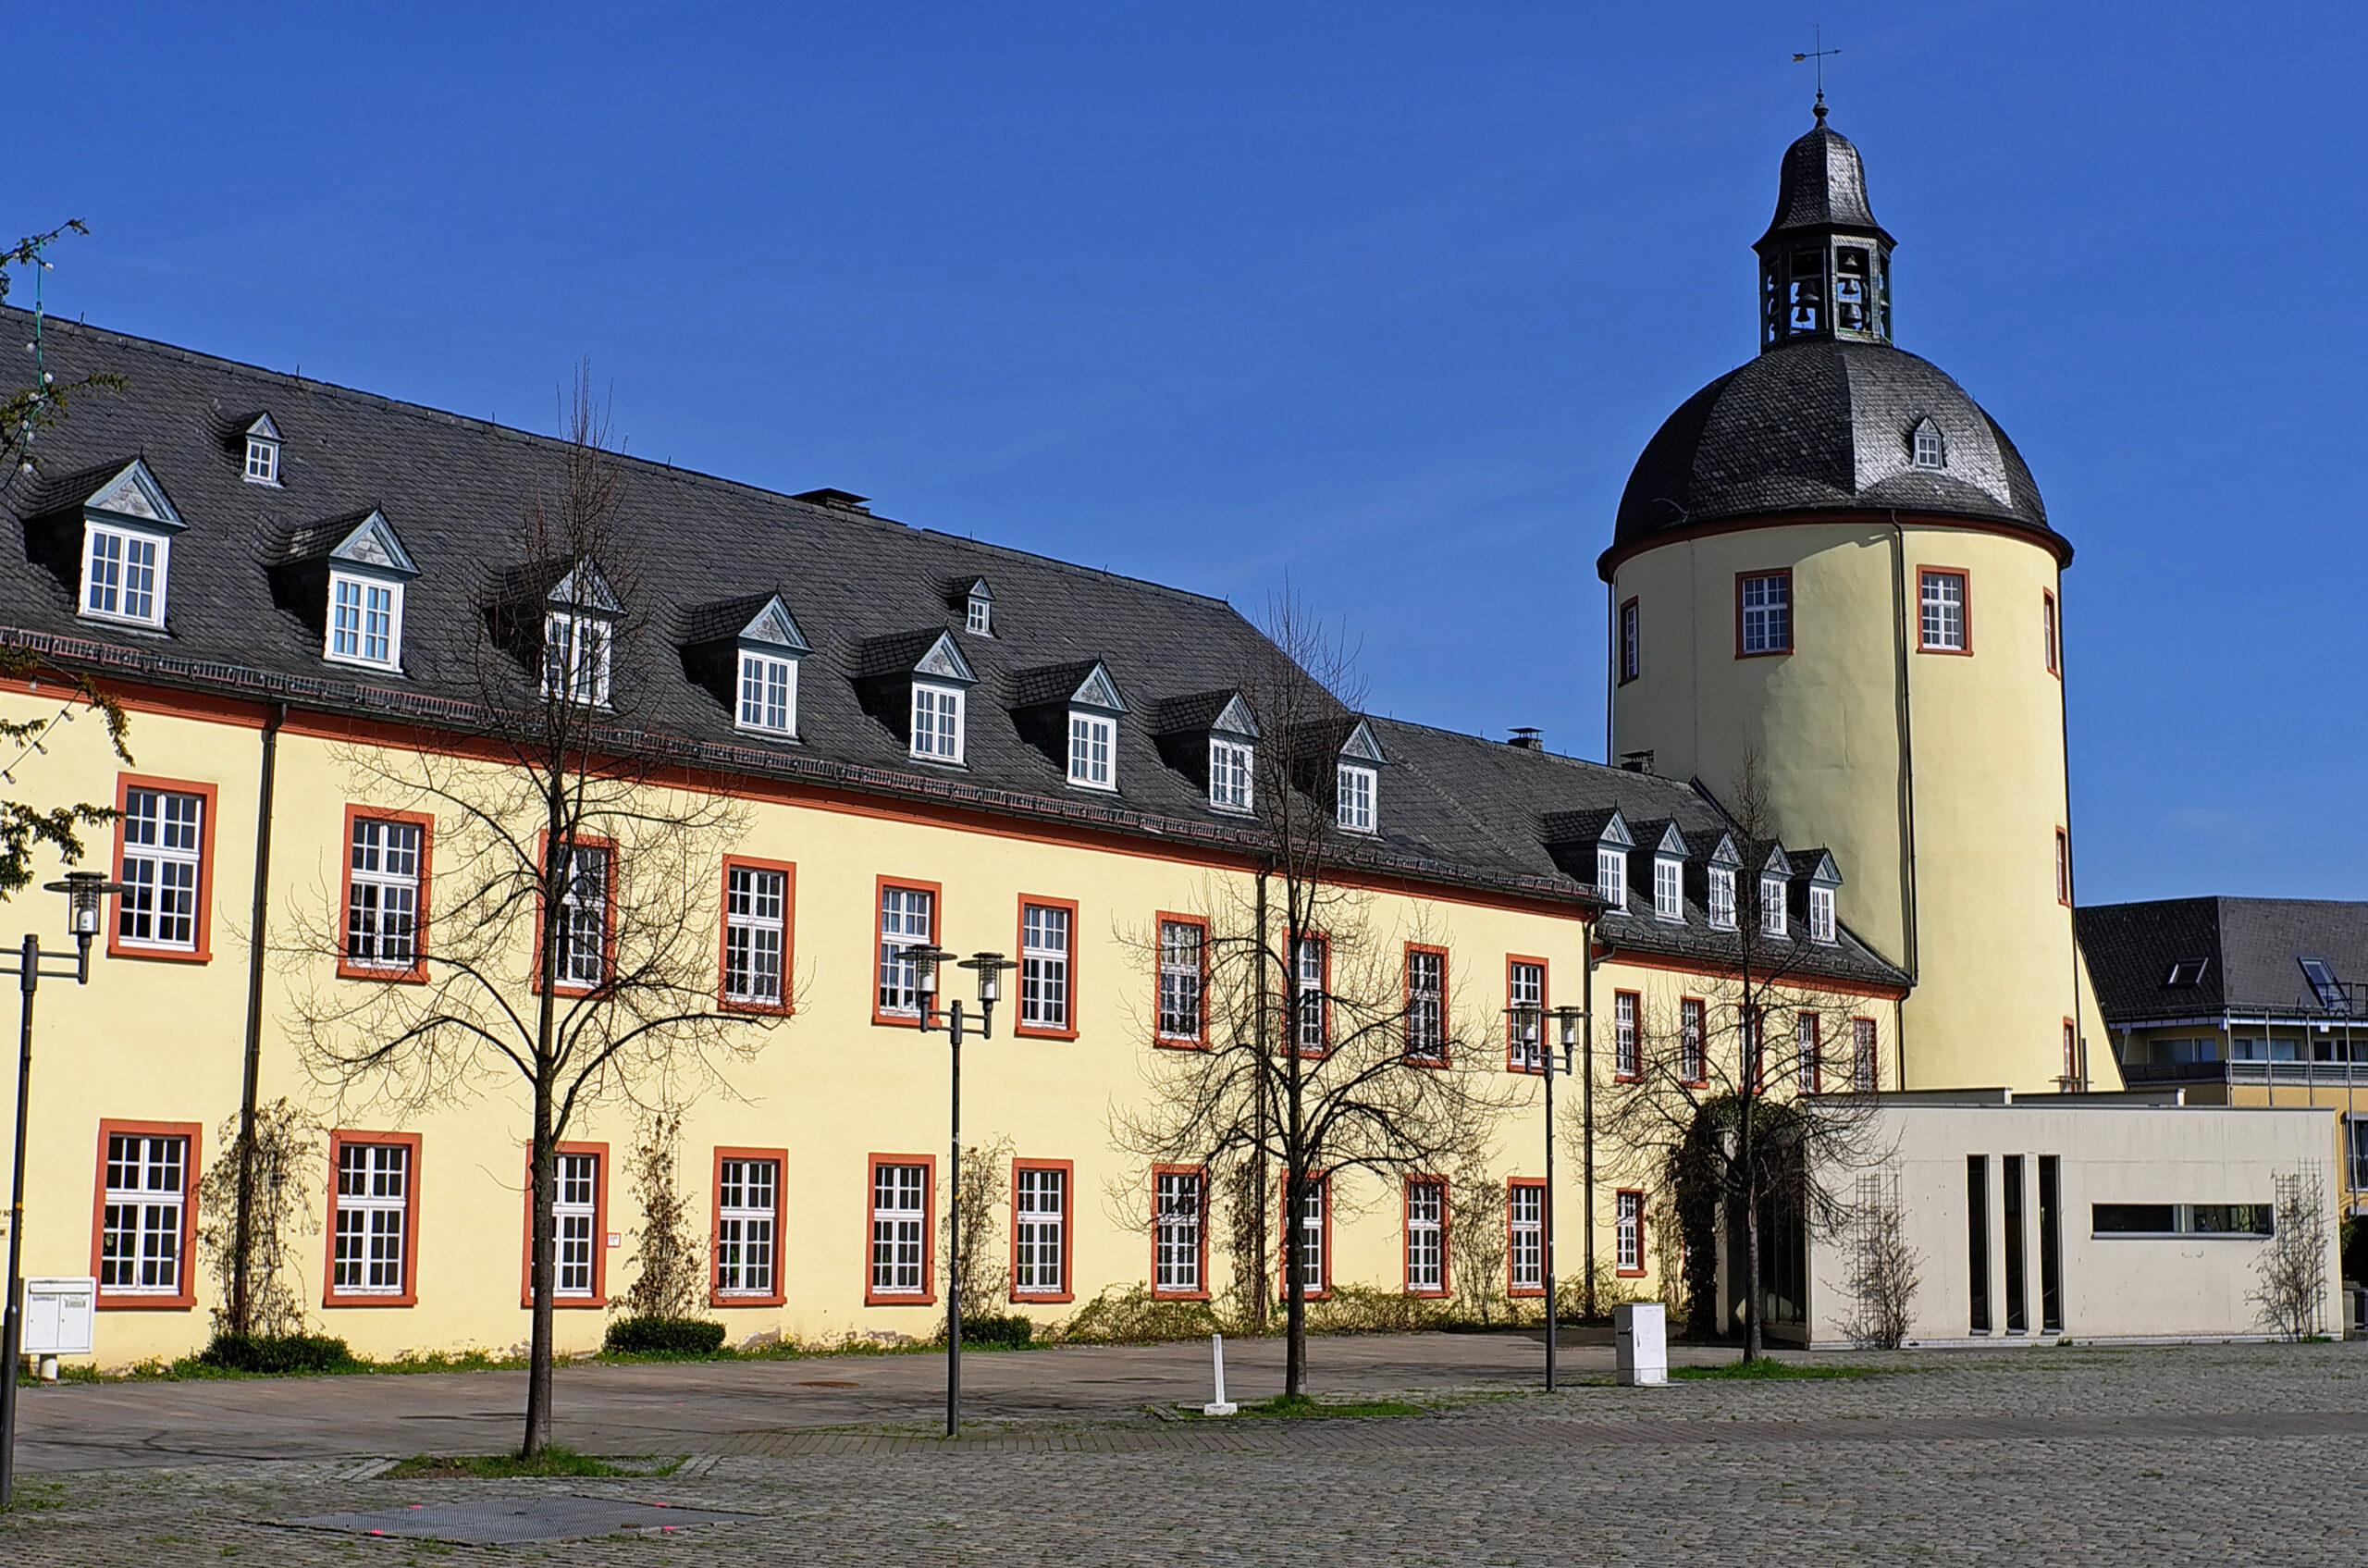 Siegen_Unteres Schloss_StadtSiegen2010